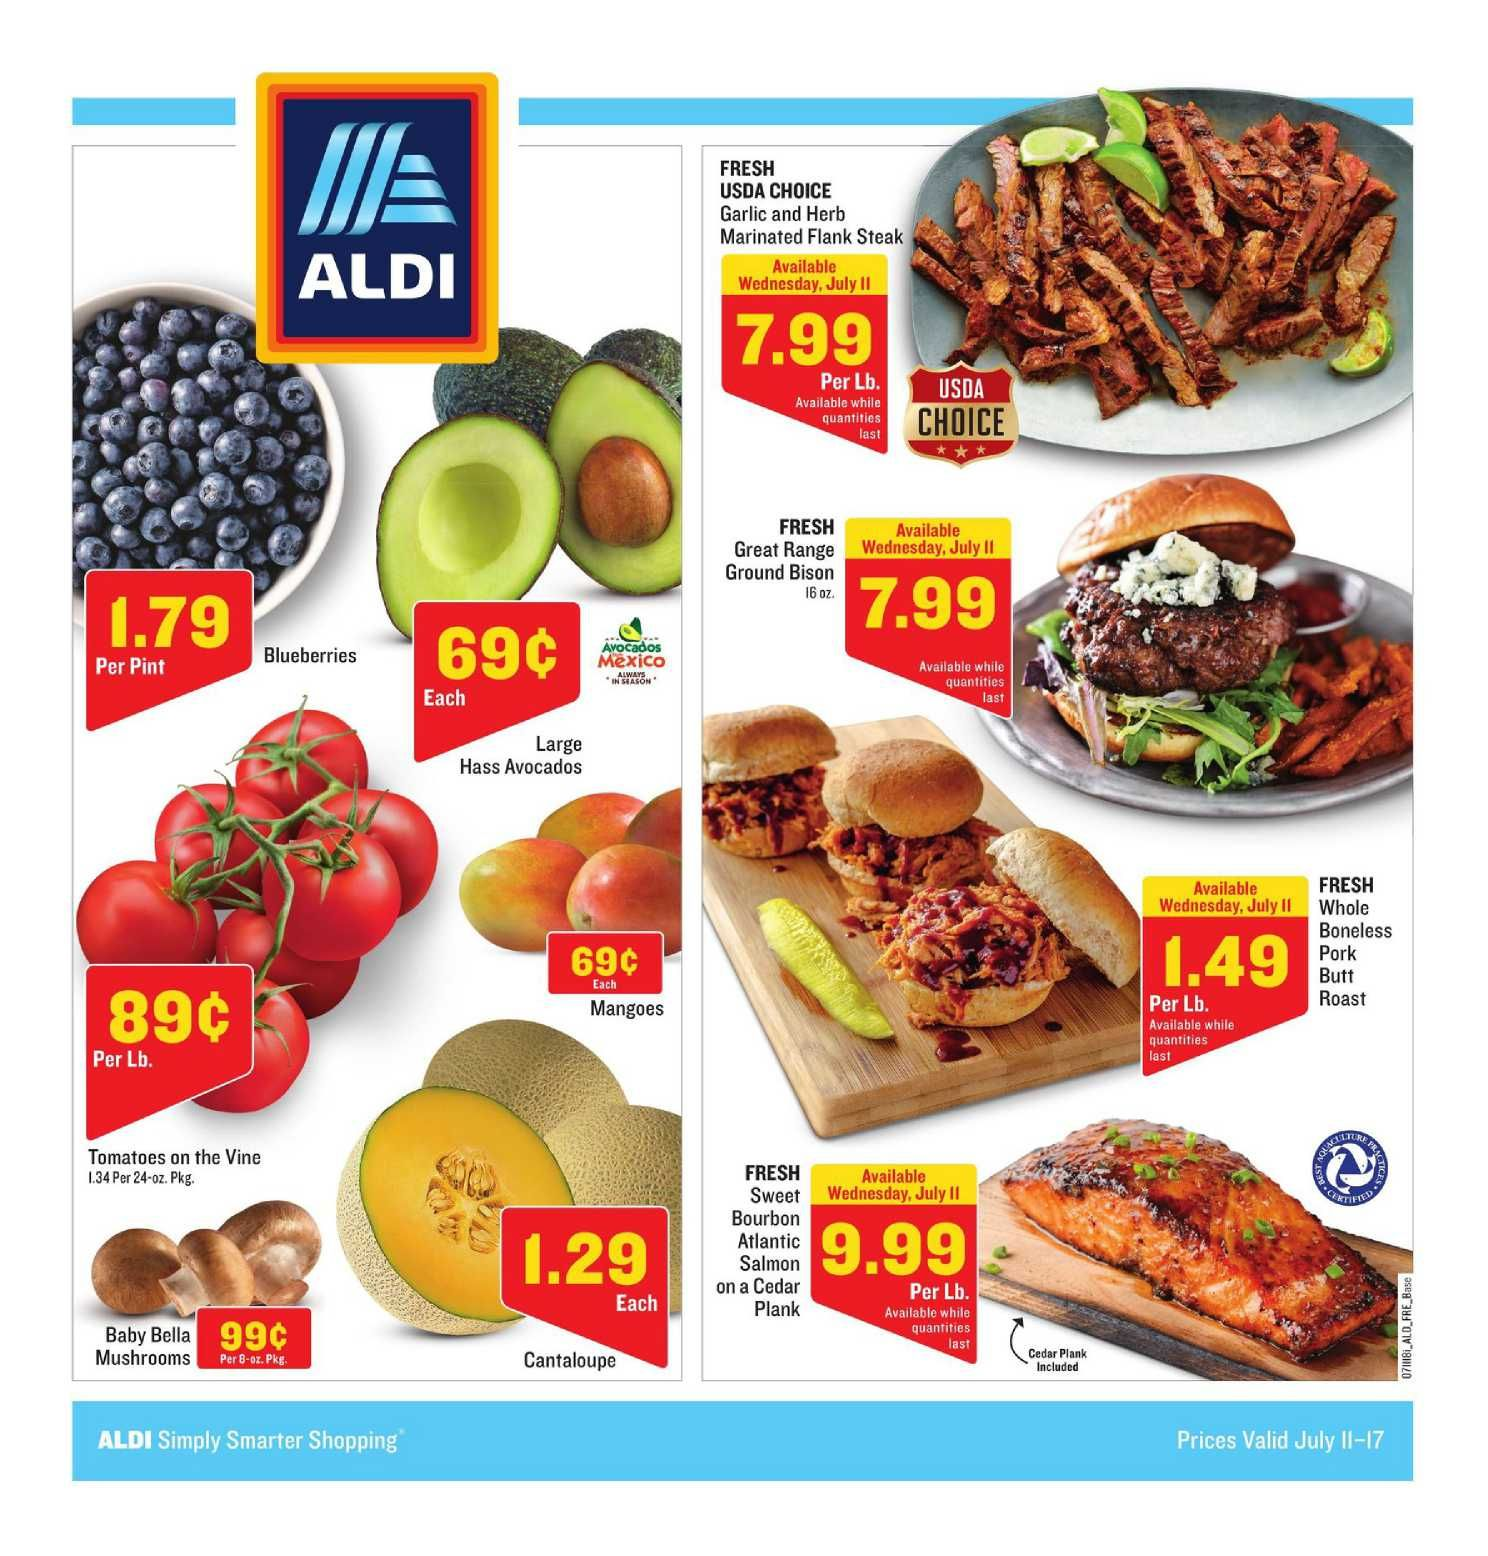 Aldi Weekly Ad Flyer September 25 October 1 2019 Weeklyad123 Com Weekly Ad Circular Grocery Stores Bakery Menu Fresh Meat Aldi